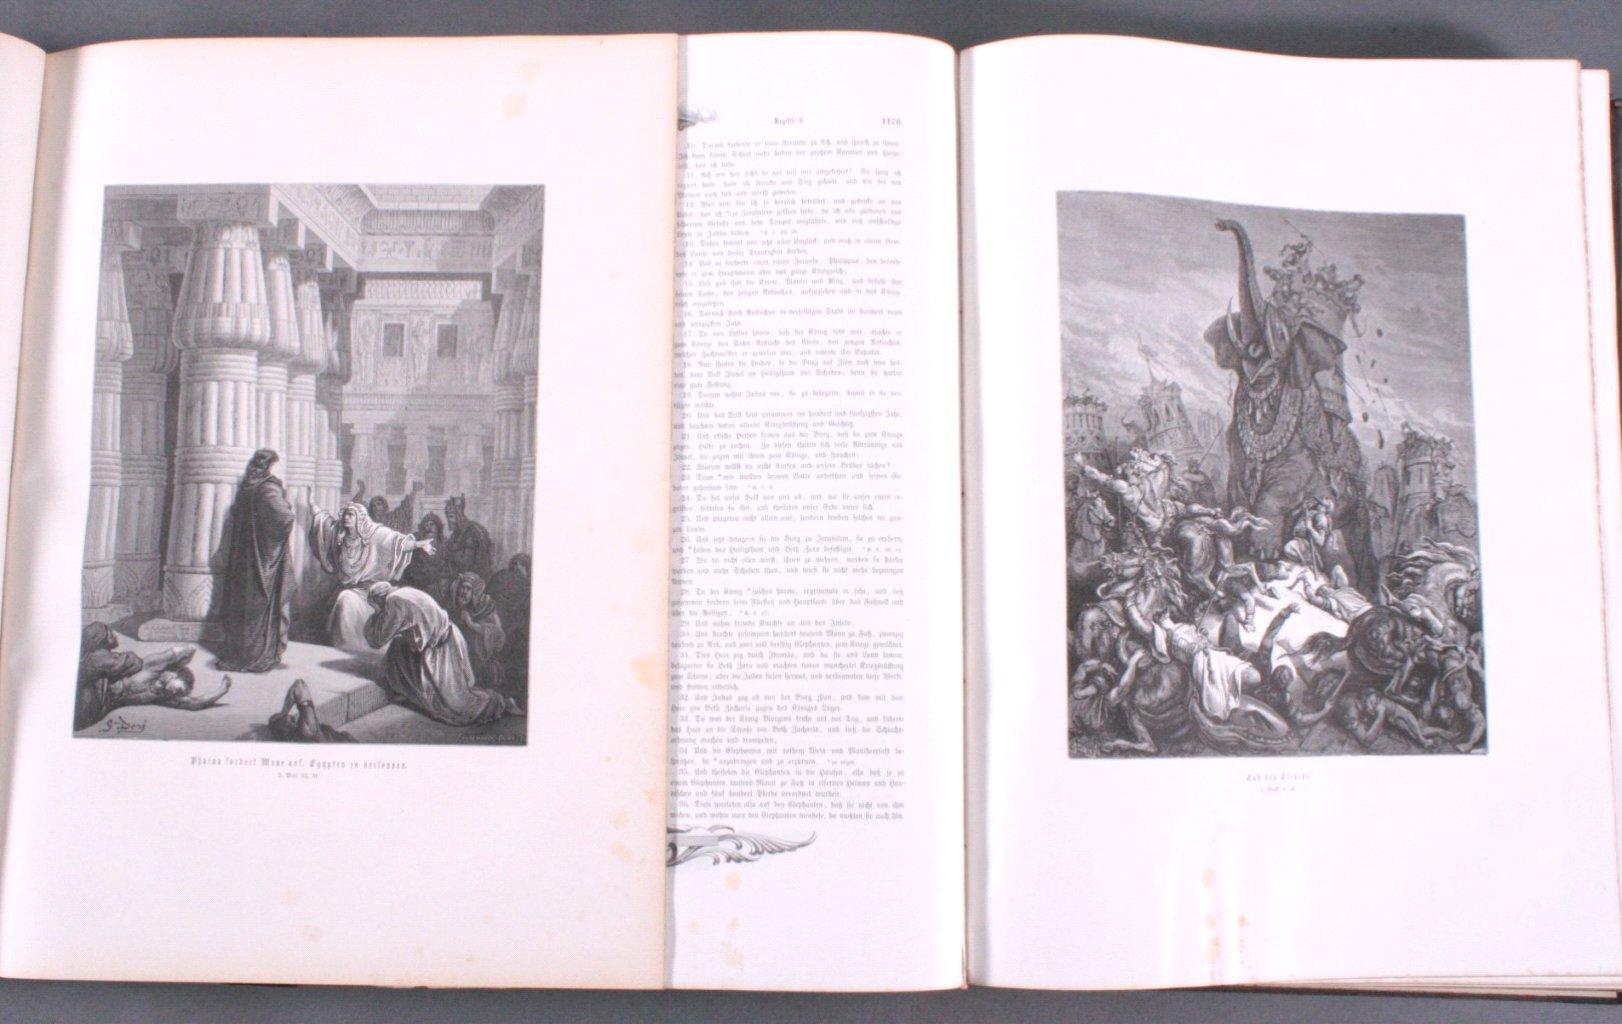 Doré – Bibel 2 Bände, wohl 1884-4